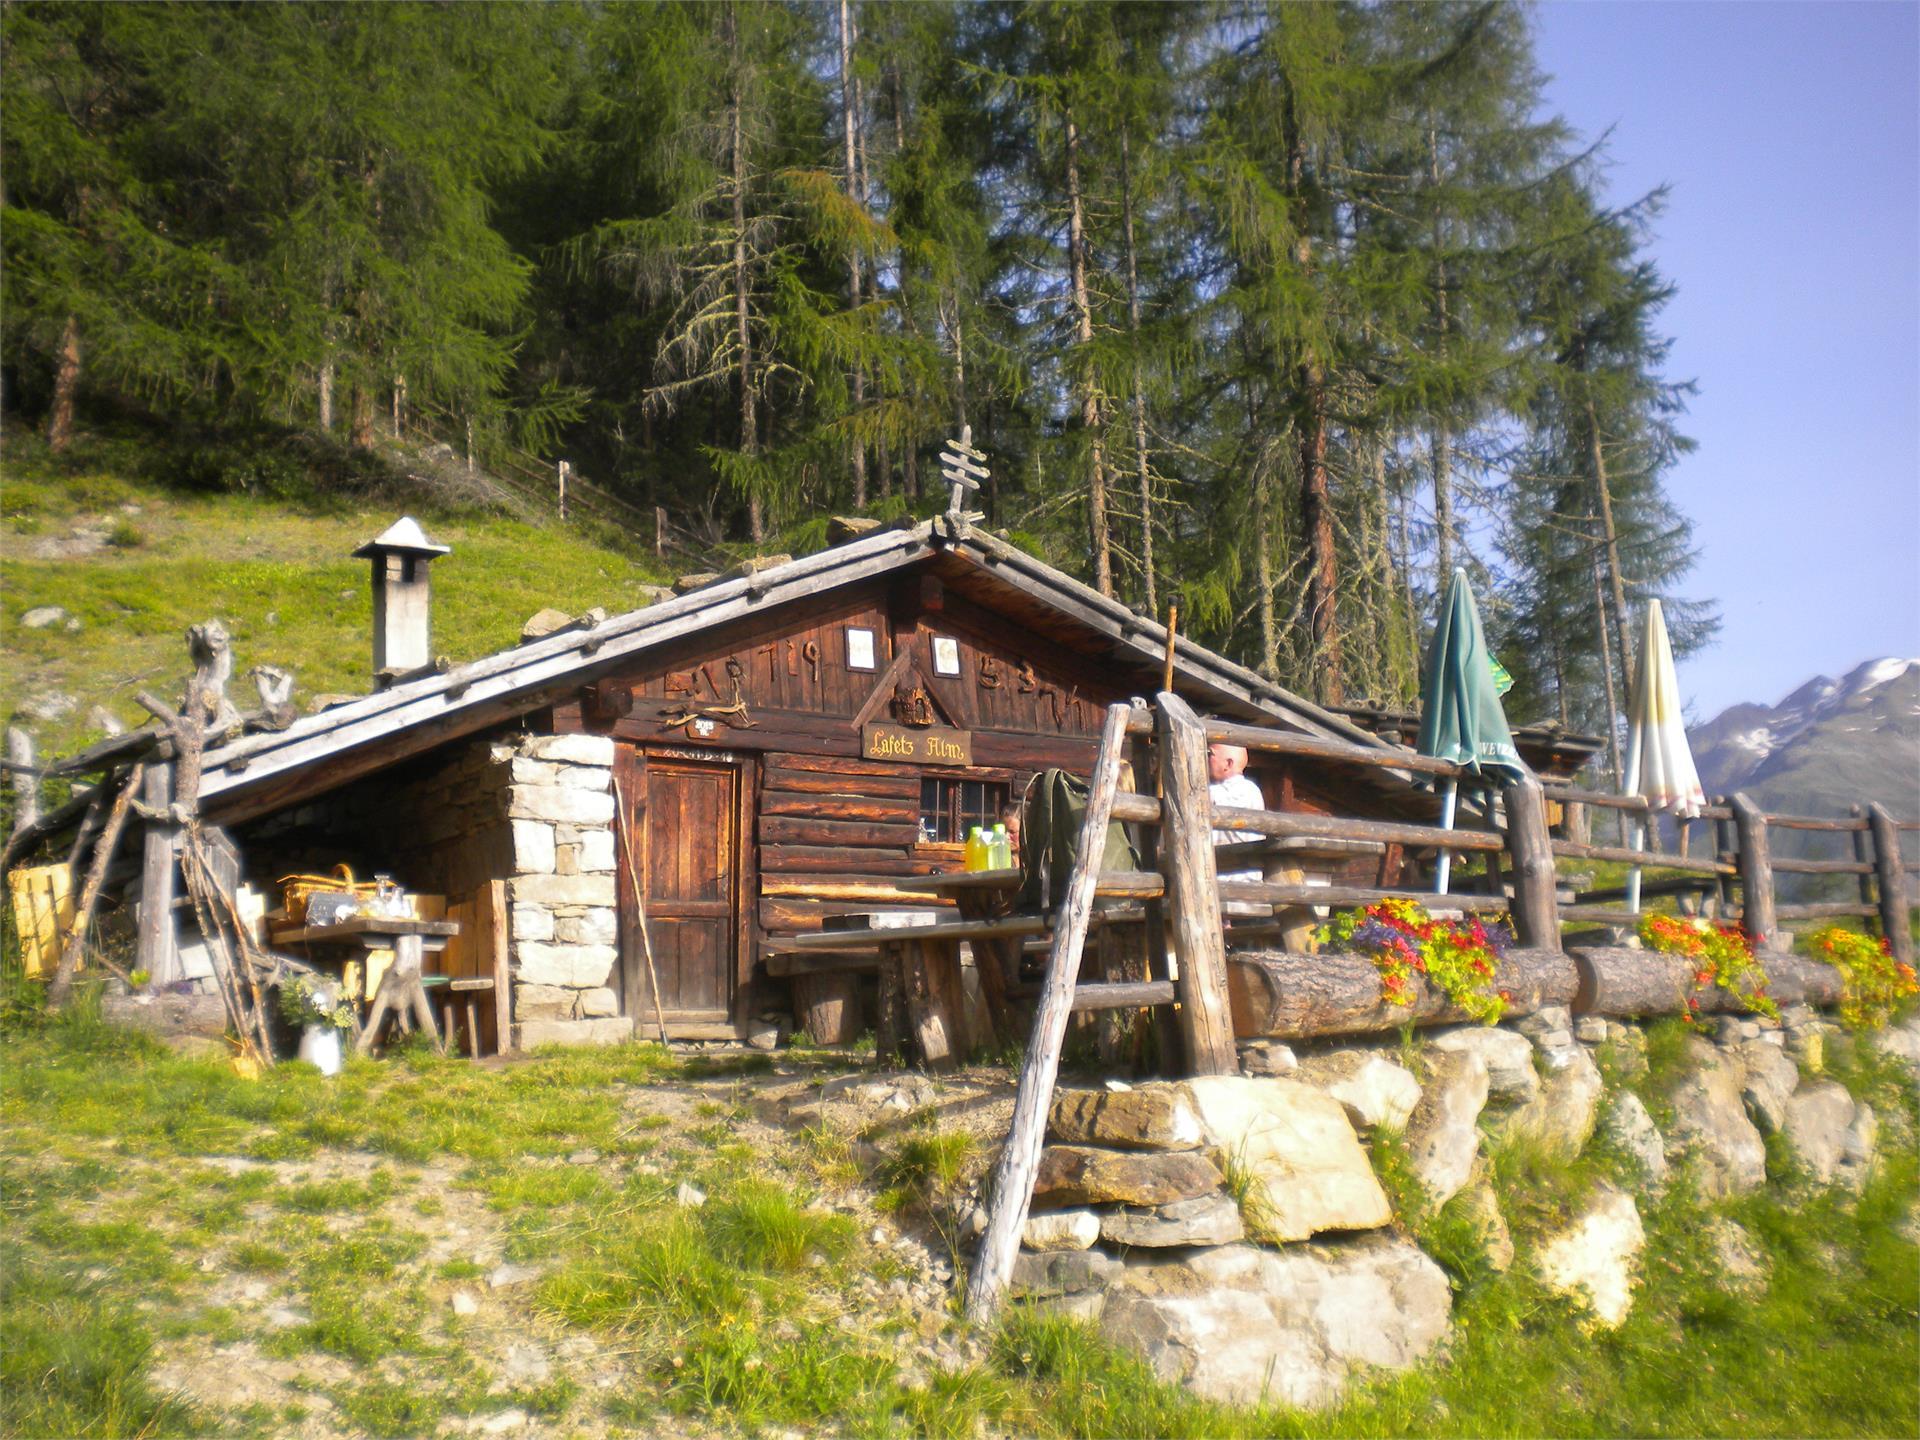 Penaud Mountain Trail